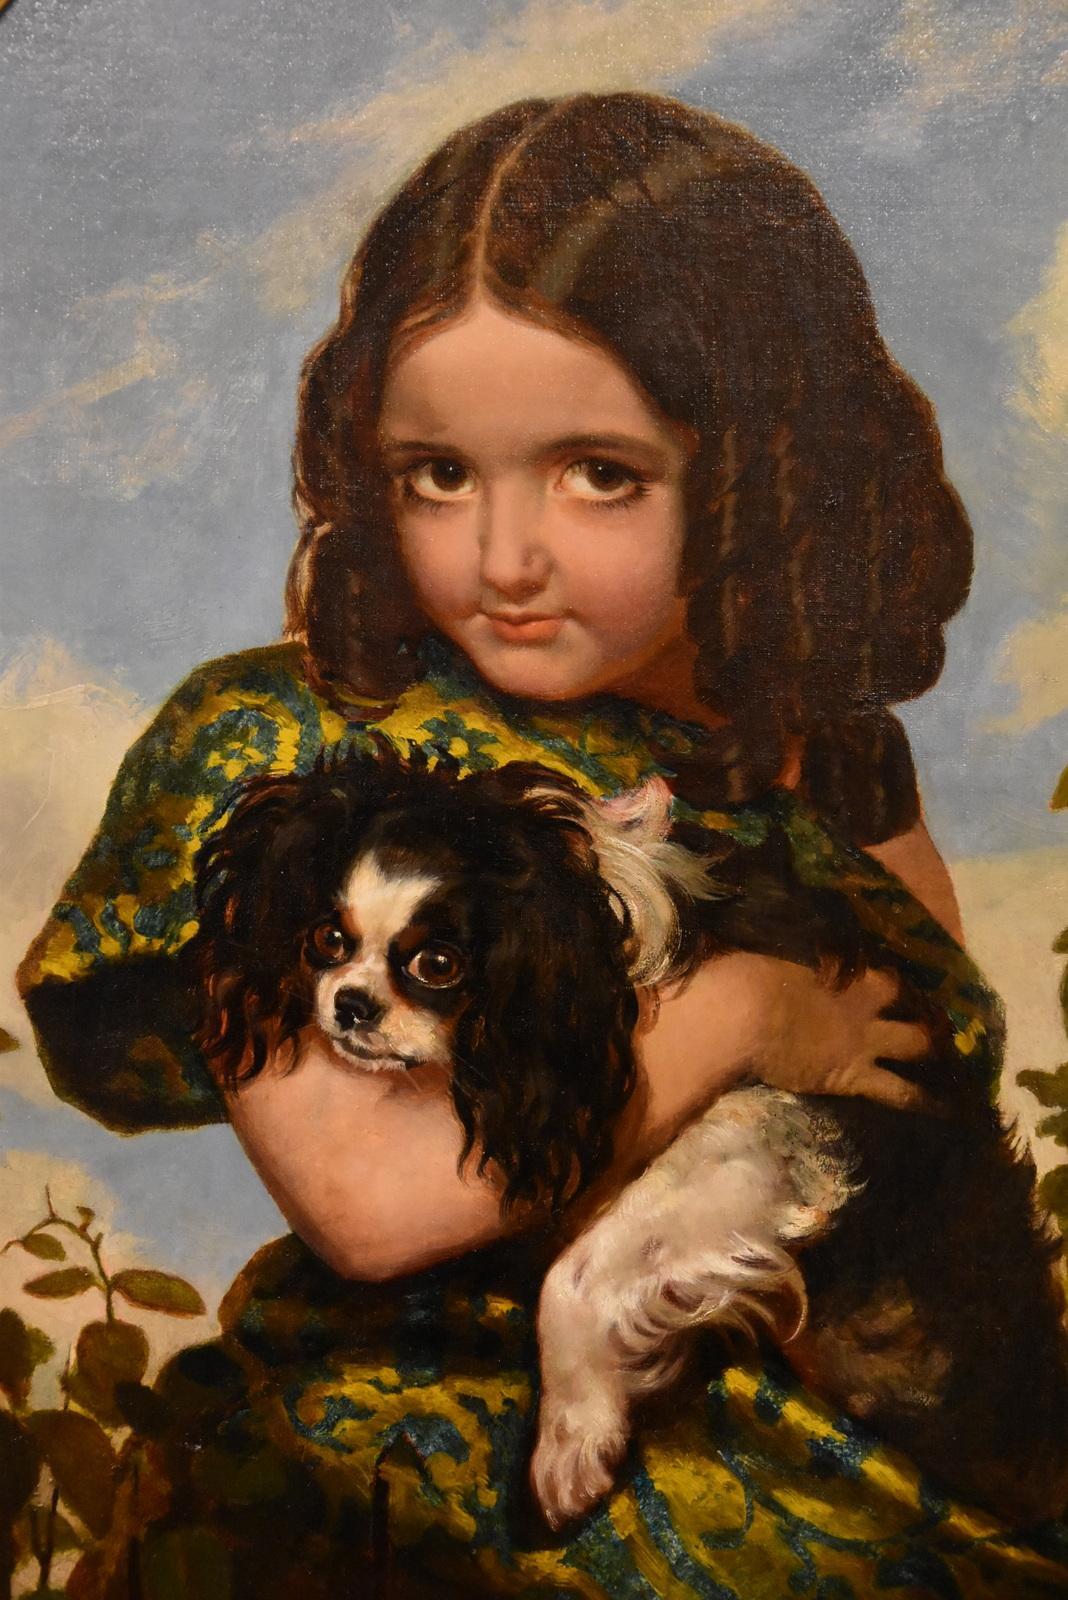 """Best of Friends"" Oil Painting by John Harris"